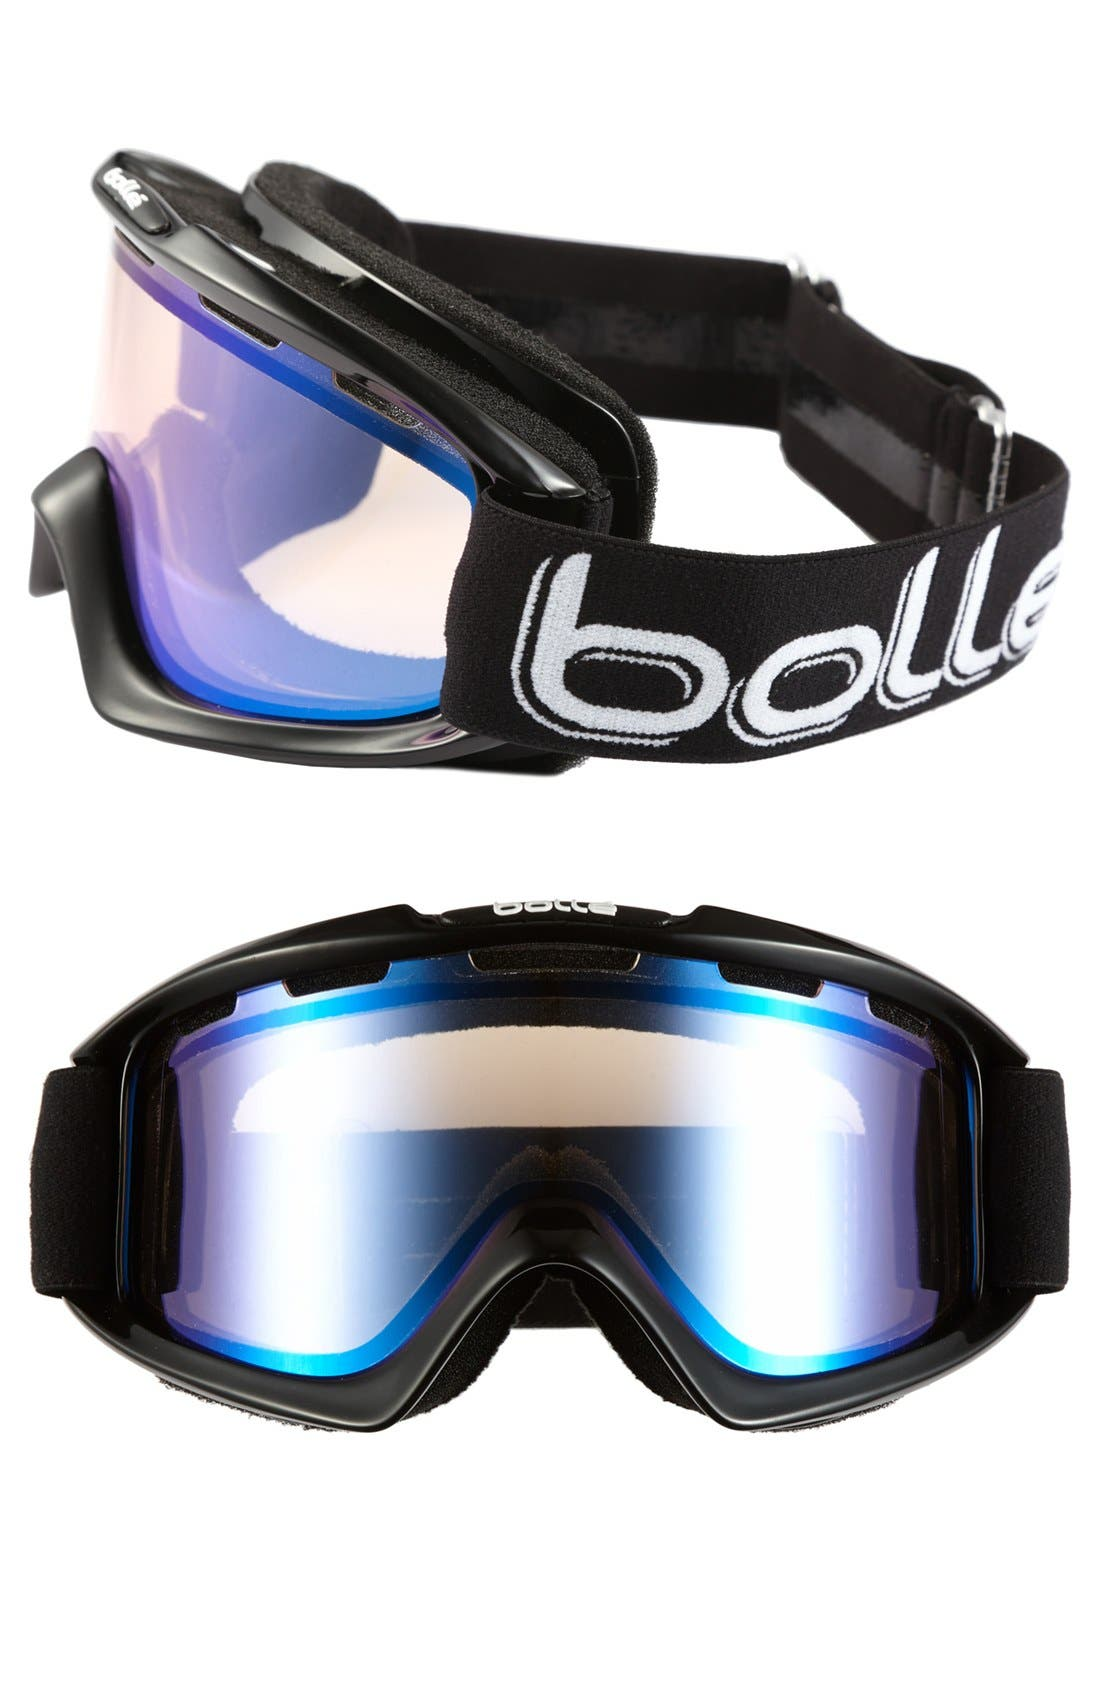 Alternate Image 1 Selected - Bolle 'Nova' Ski Goggles